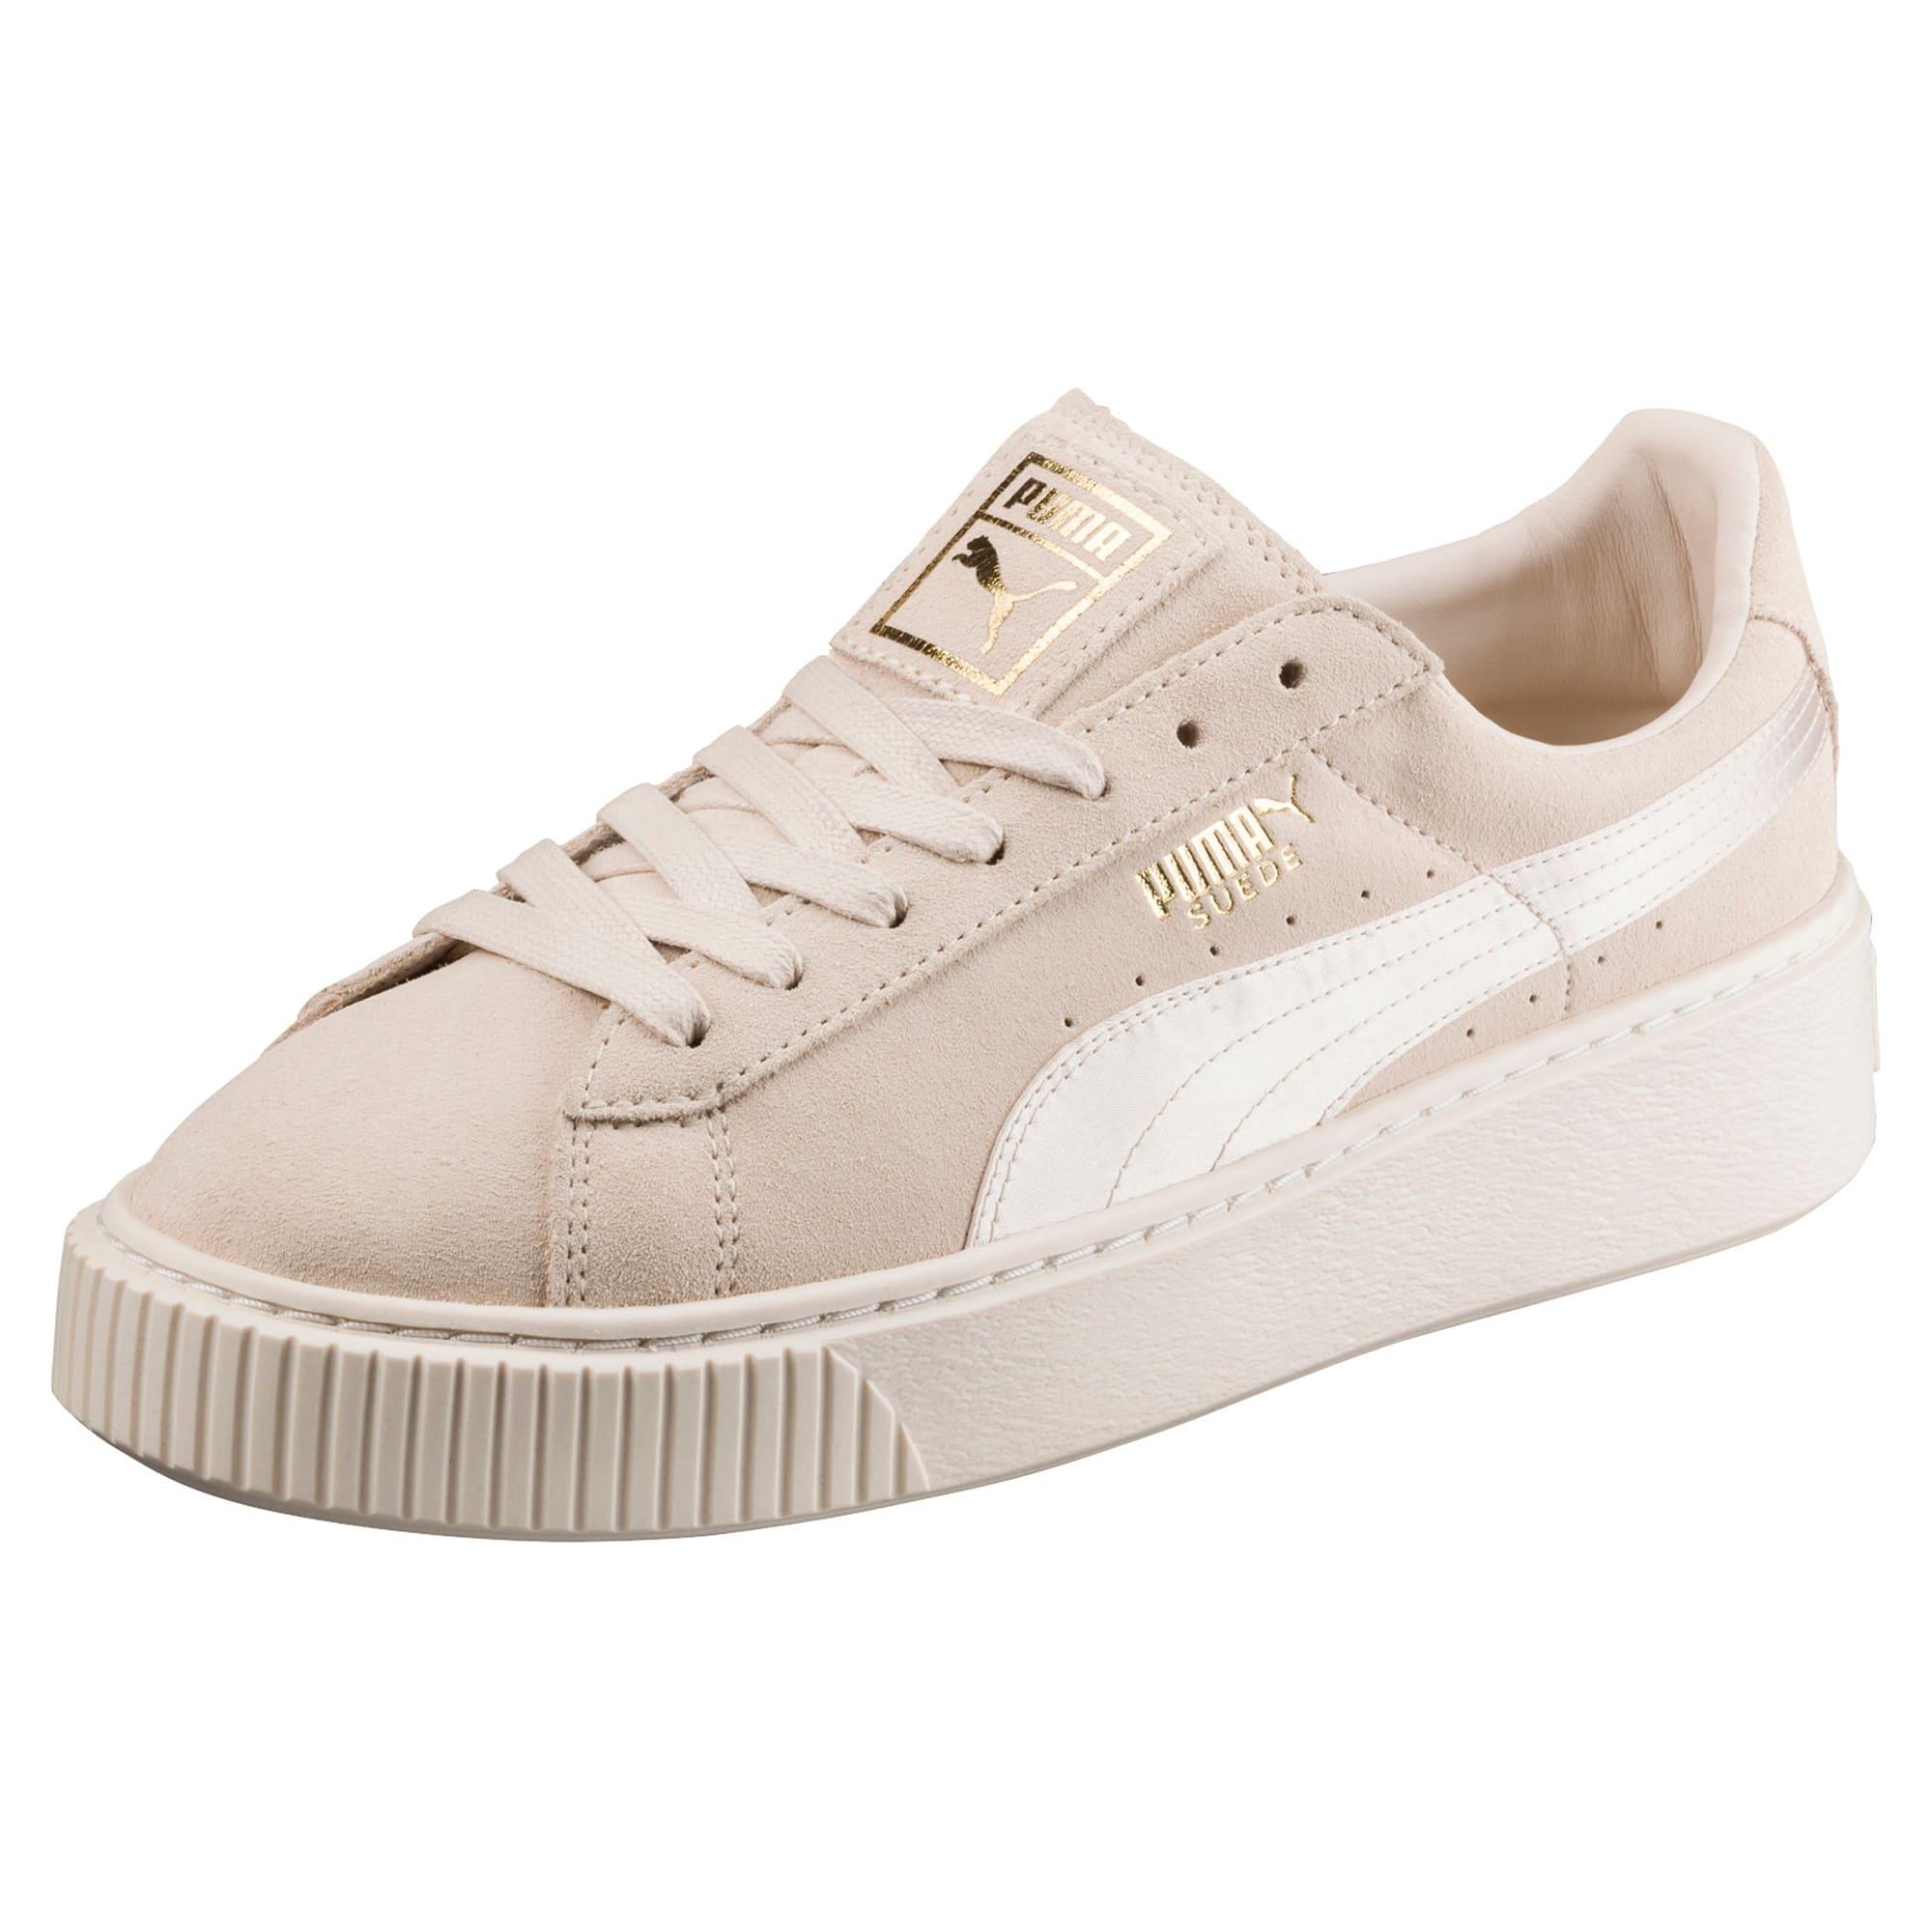 the best attitude 95d9e 39545 Suede Summer Satin Platform Sneakers